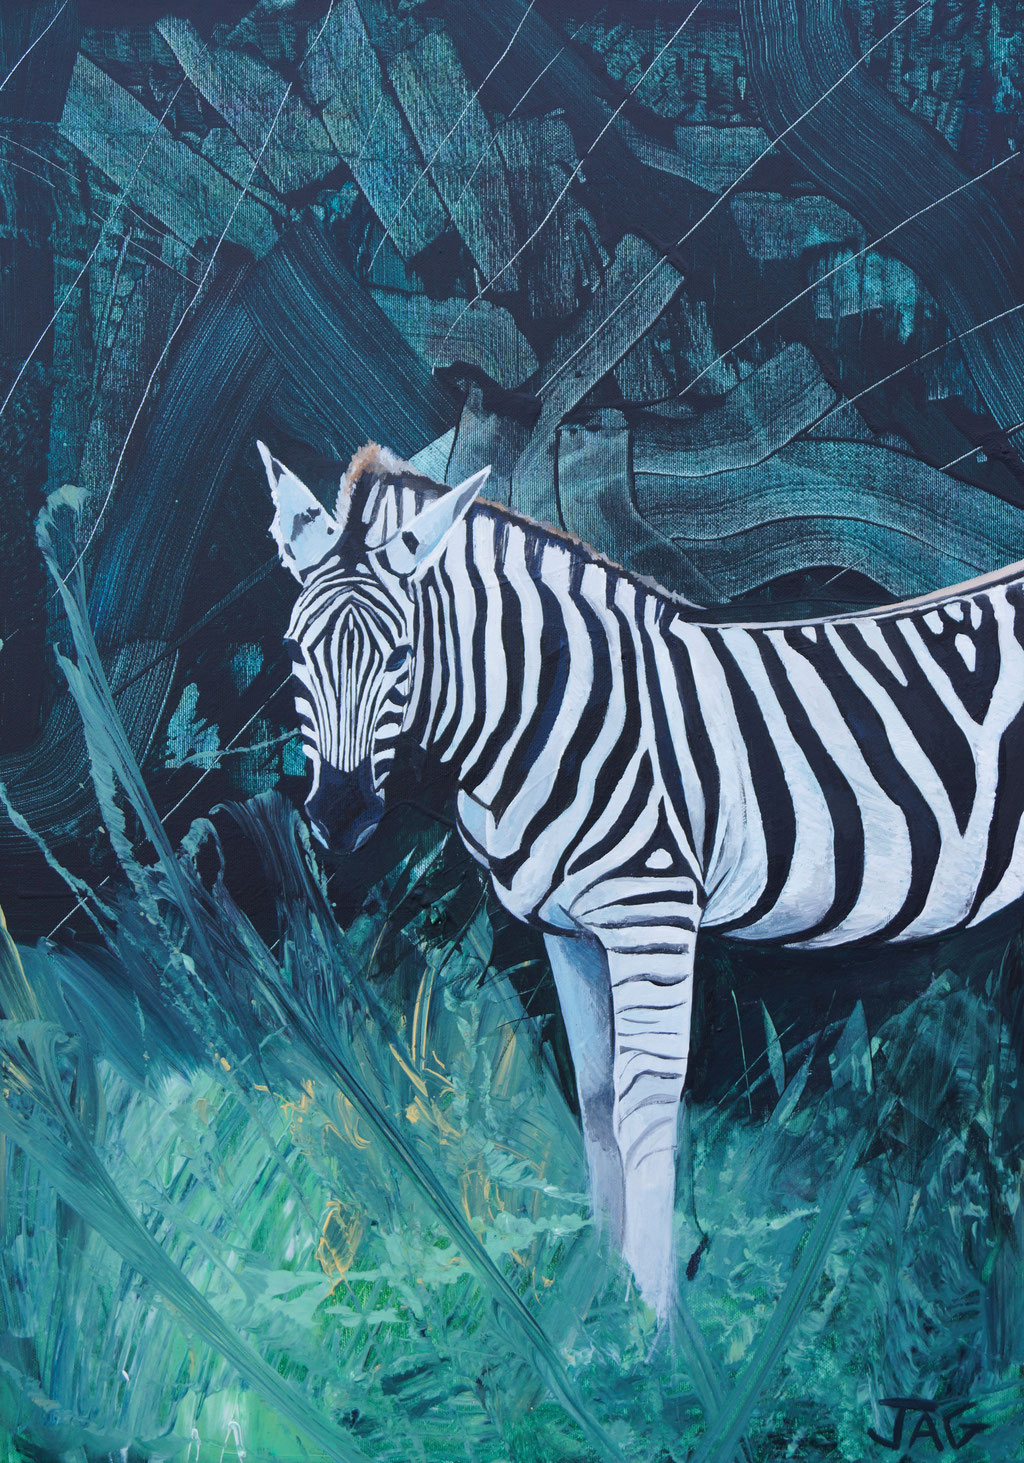 'Ziggy' acrylic on canvas, 2021, 50 x 70cm - price on request